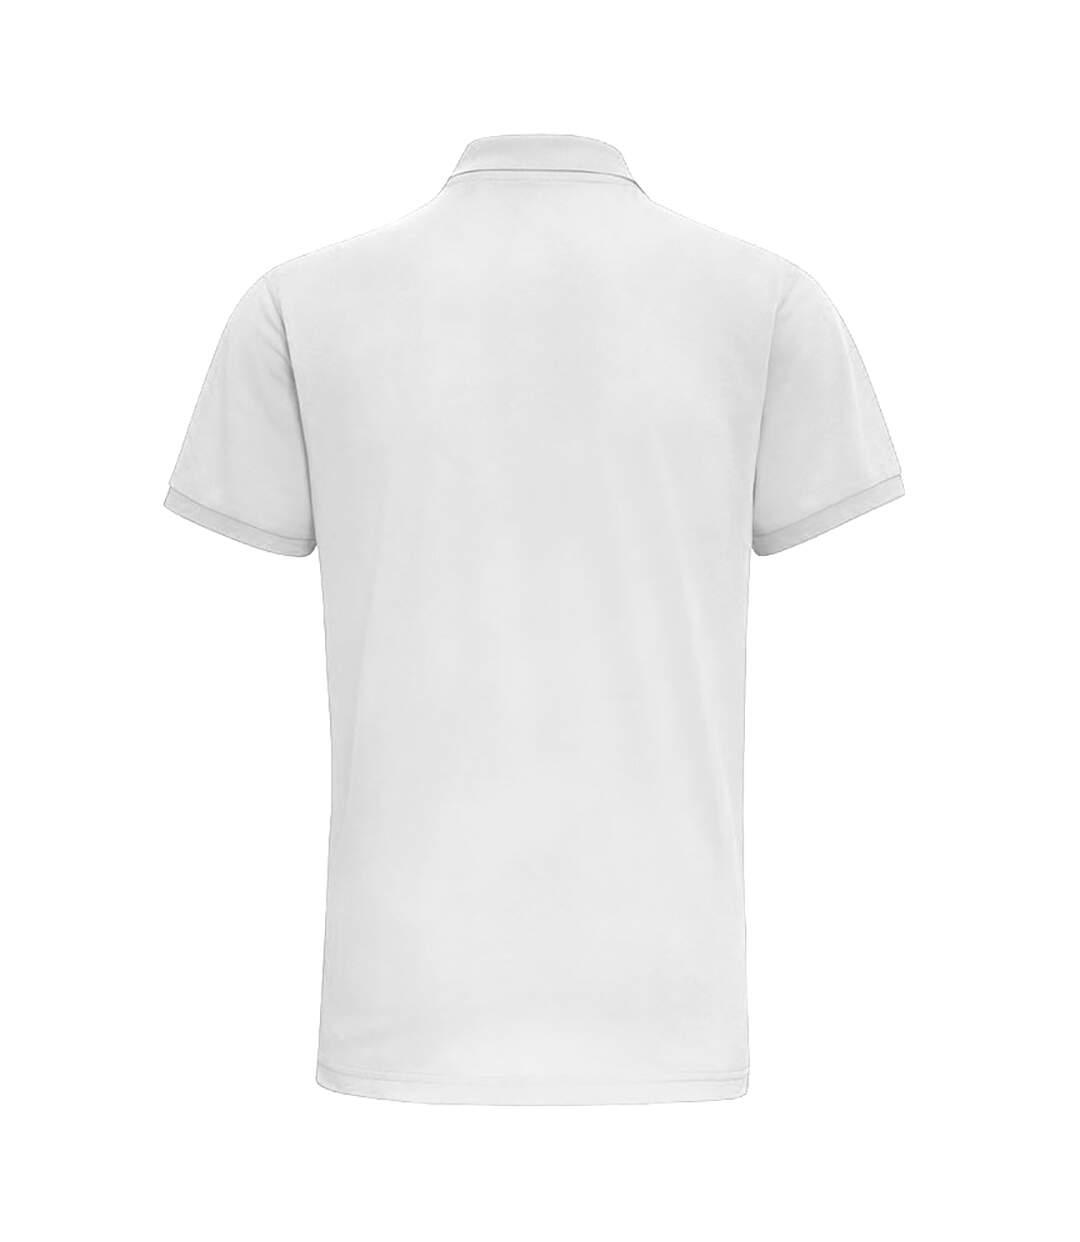 Asquith & Fox Mens Short Sleeve Performance Blend Polo Shirt (White) - UTRW5350